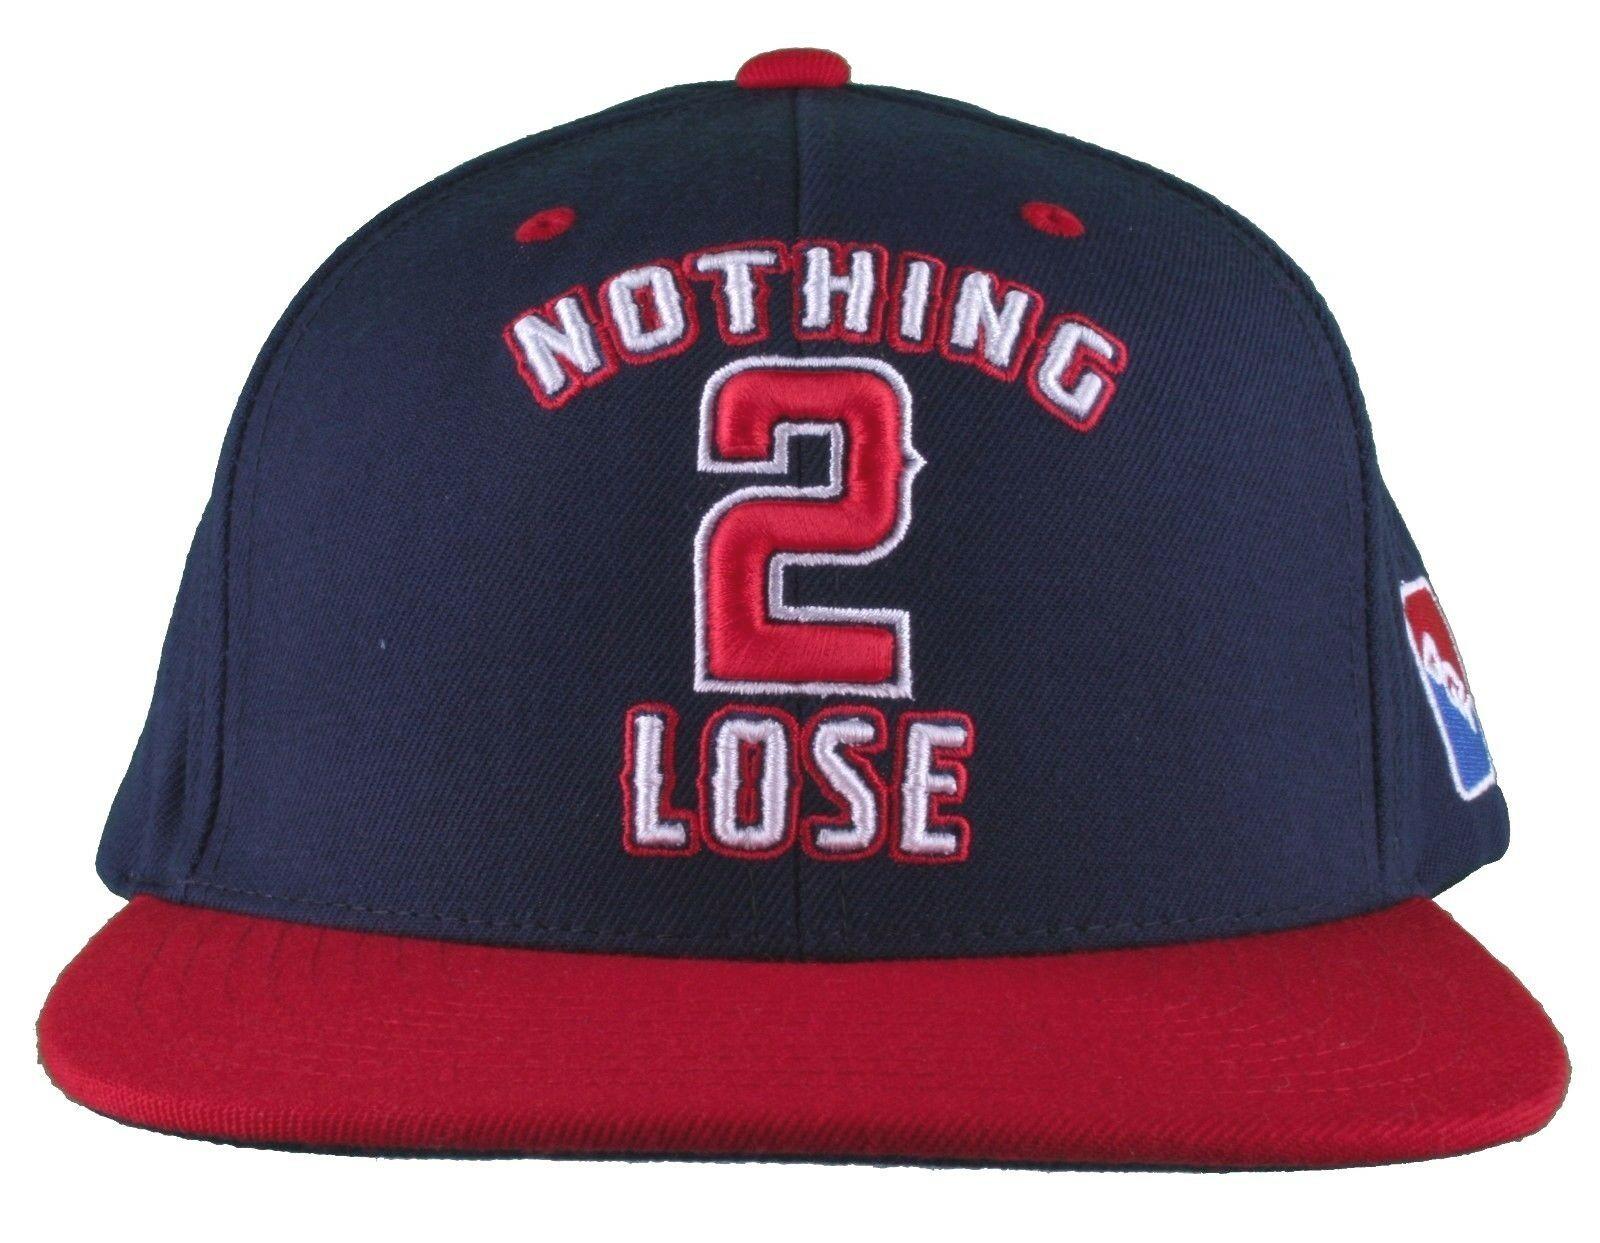 DGK Sporco Ghetto Bambini Navy Rosso Nothing To 2 Perdere Snapback Baseball Nwt